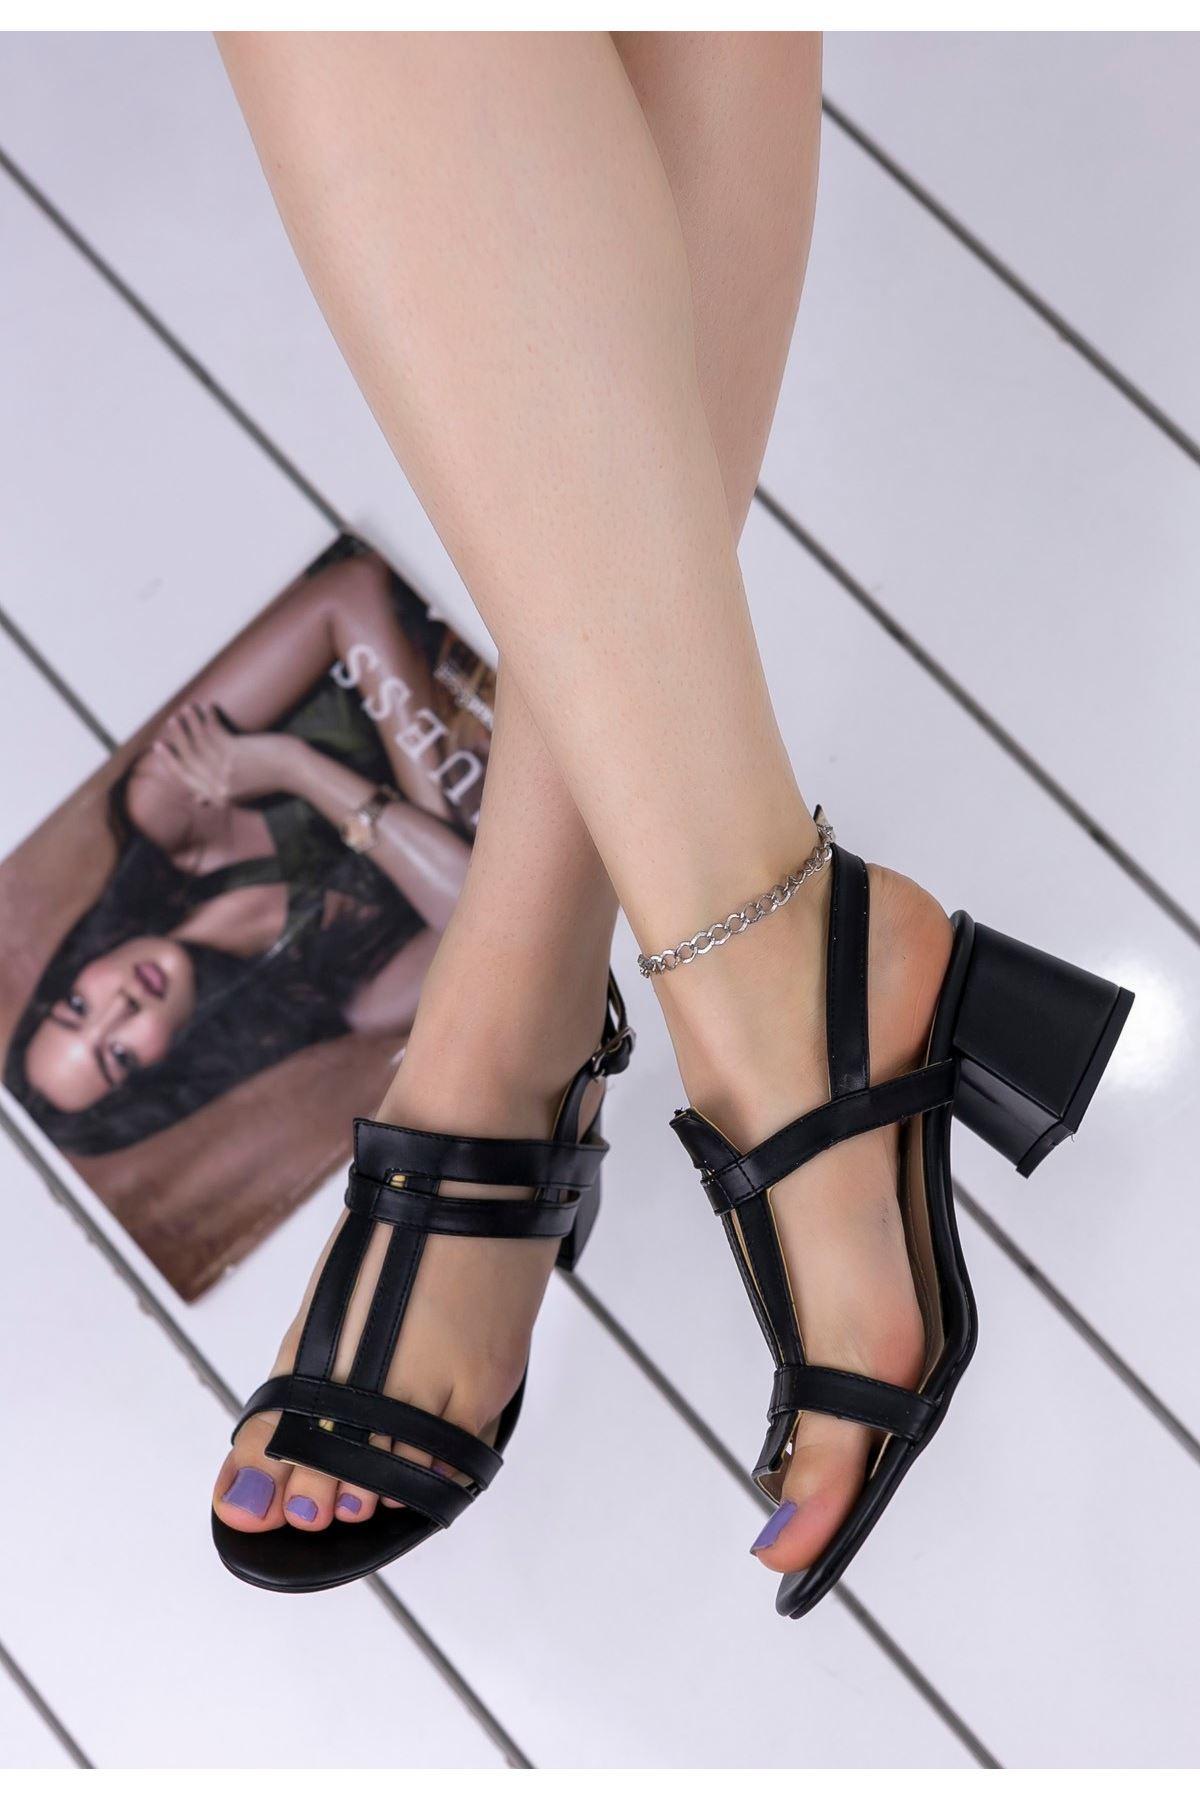 Finn Siyah Cilt Topuklu Ayakkabı